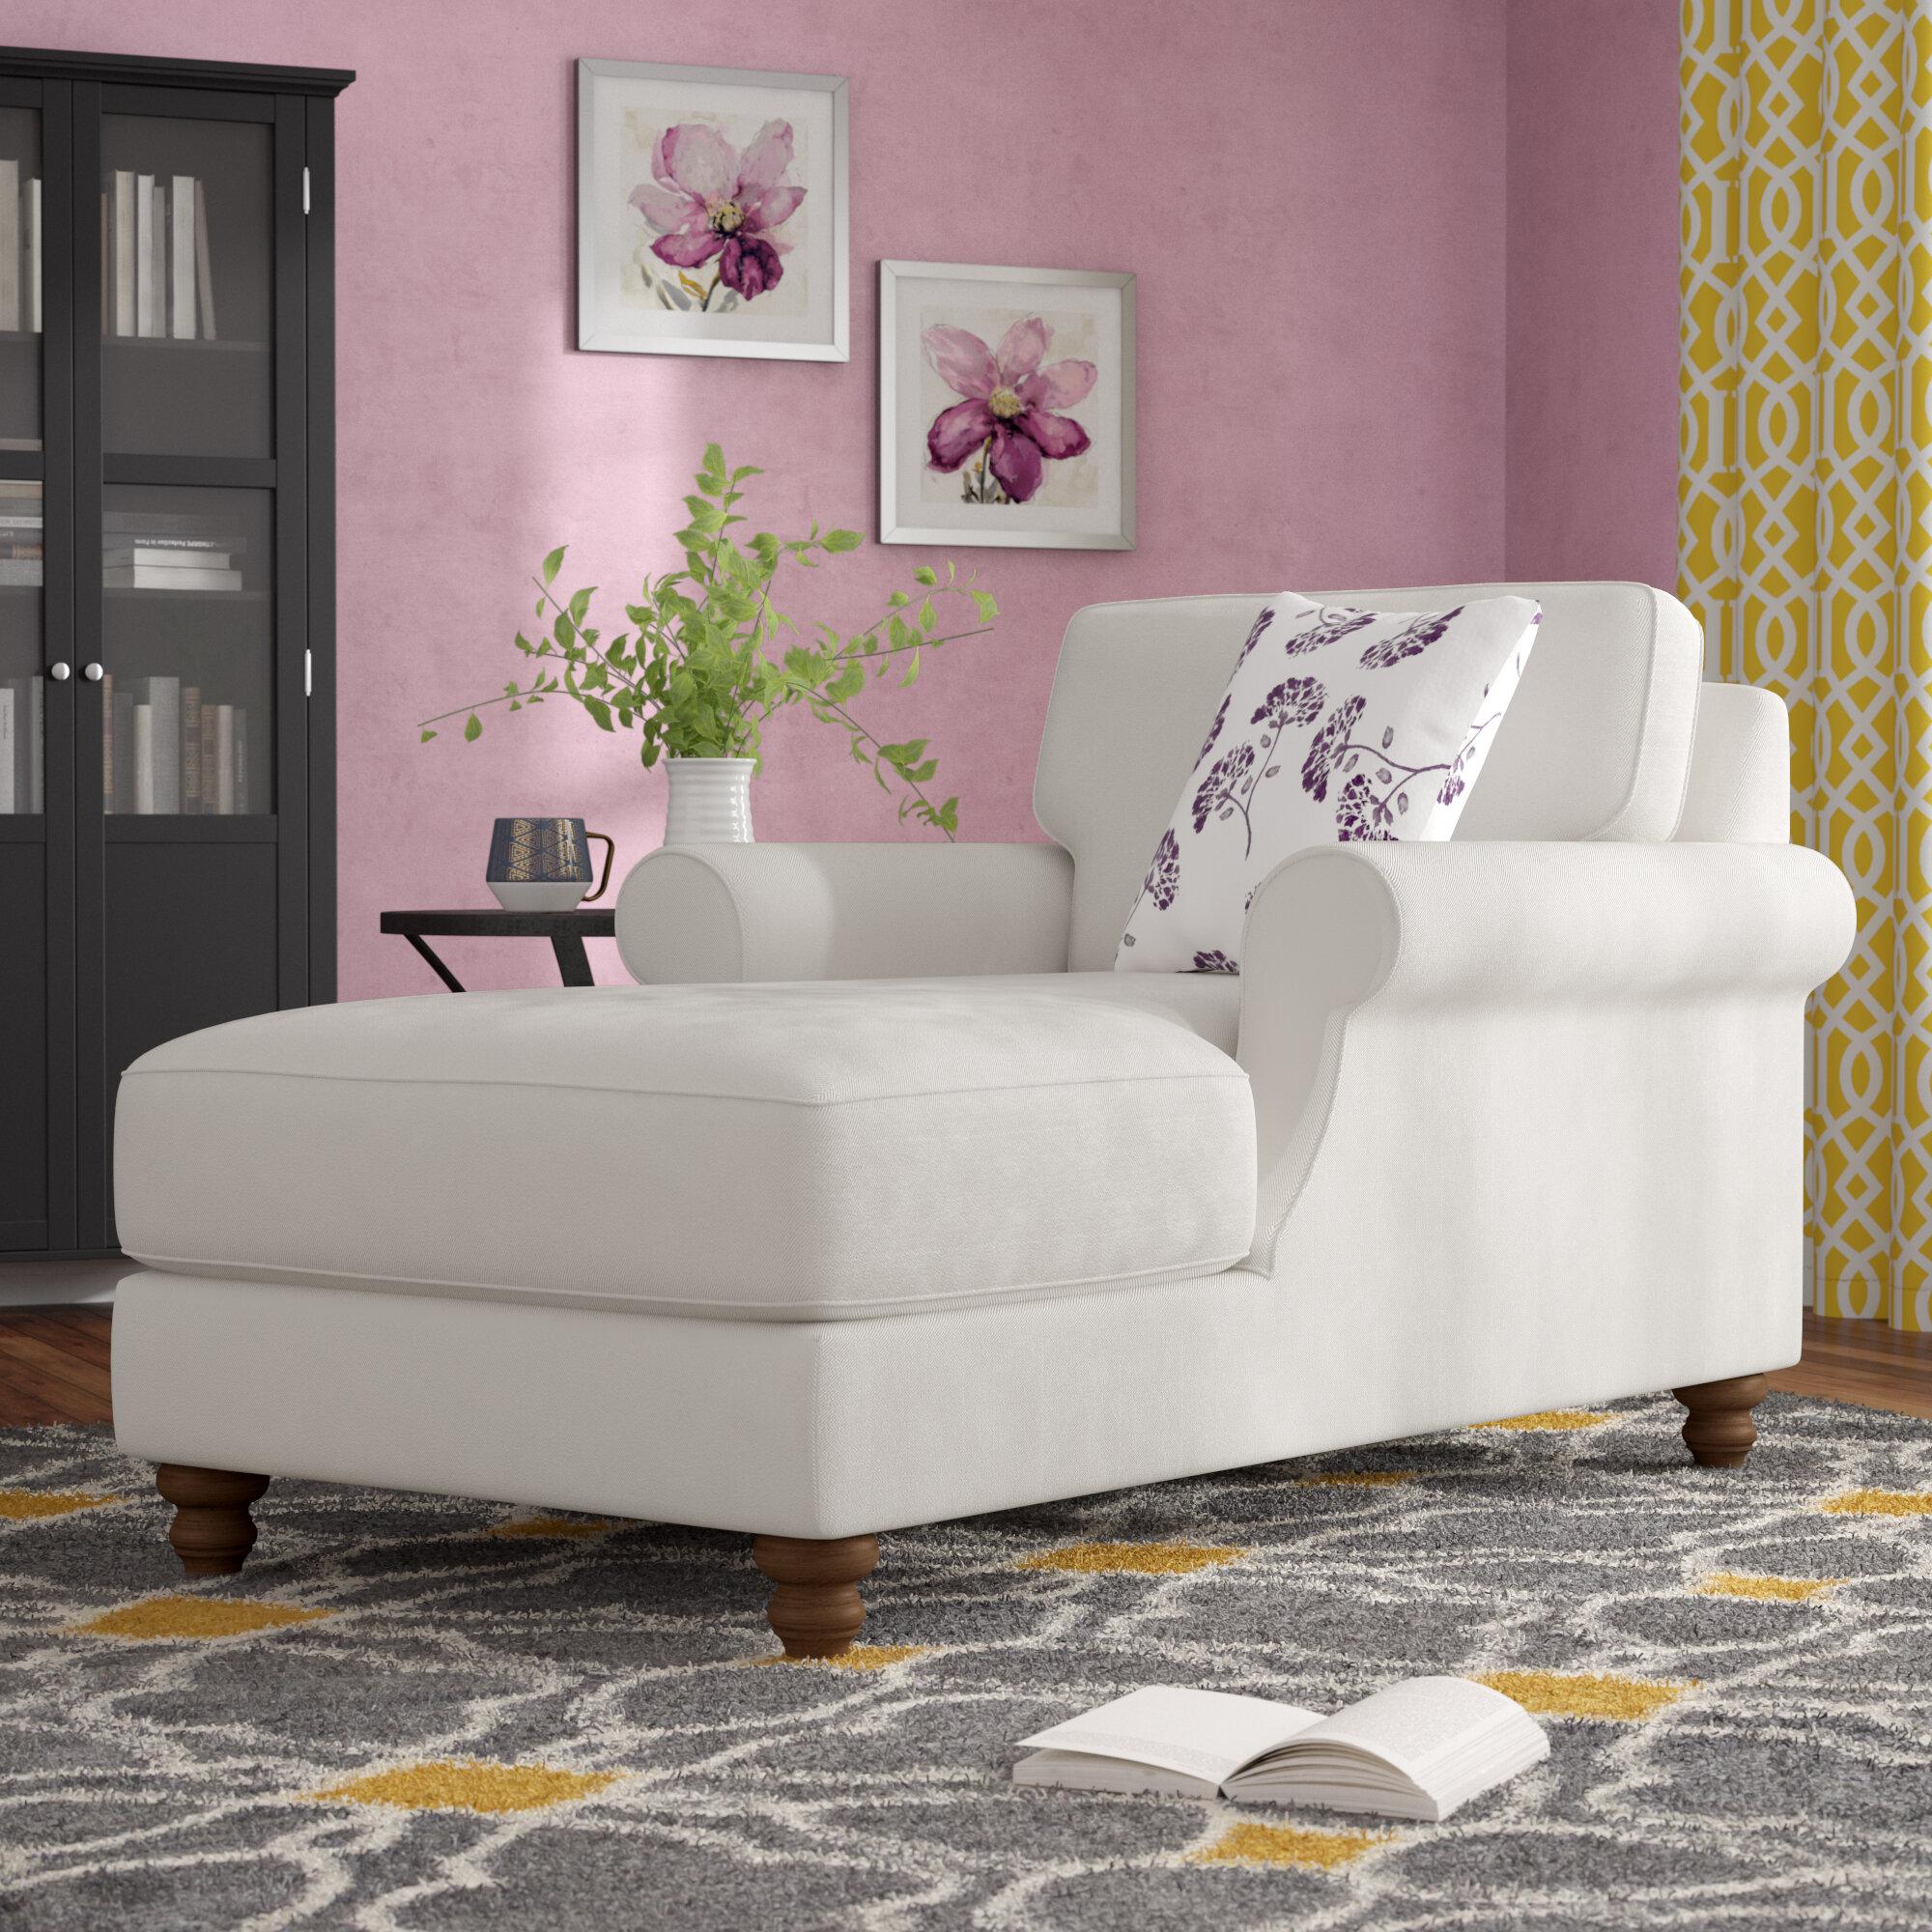 Kirkley Wellston Chaise Lounge